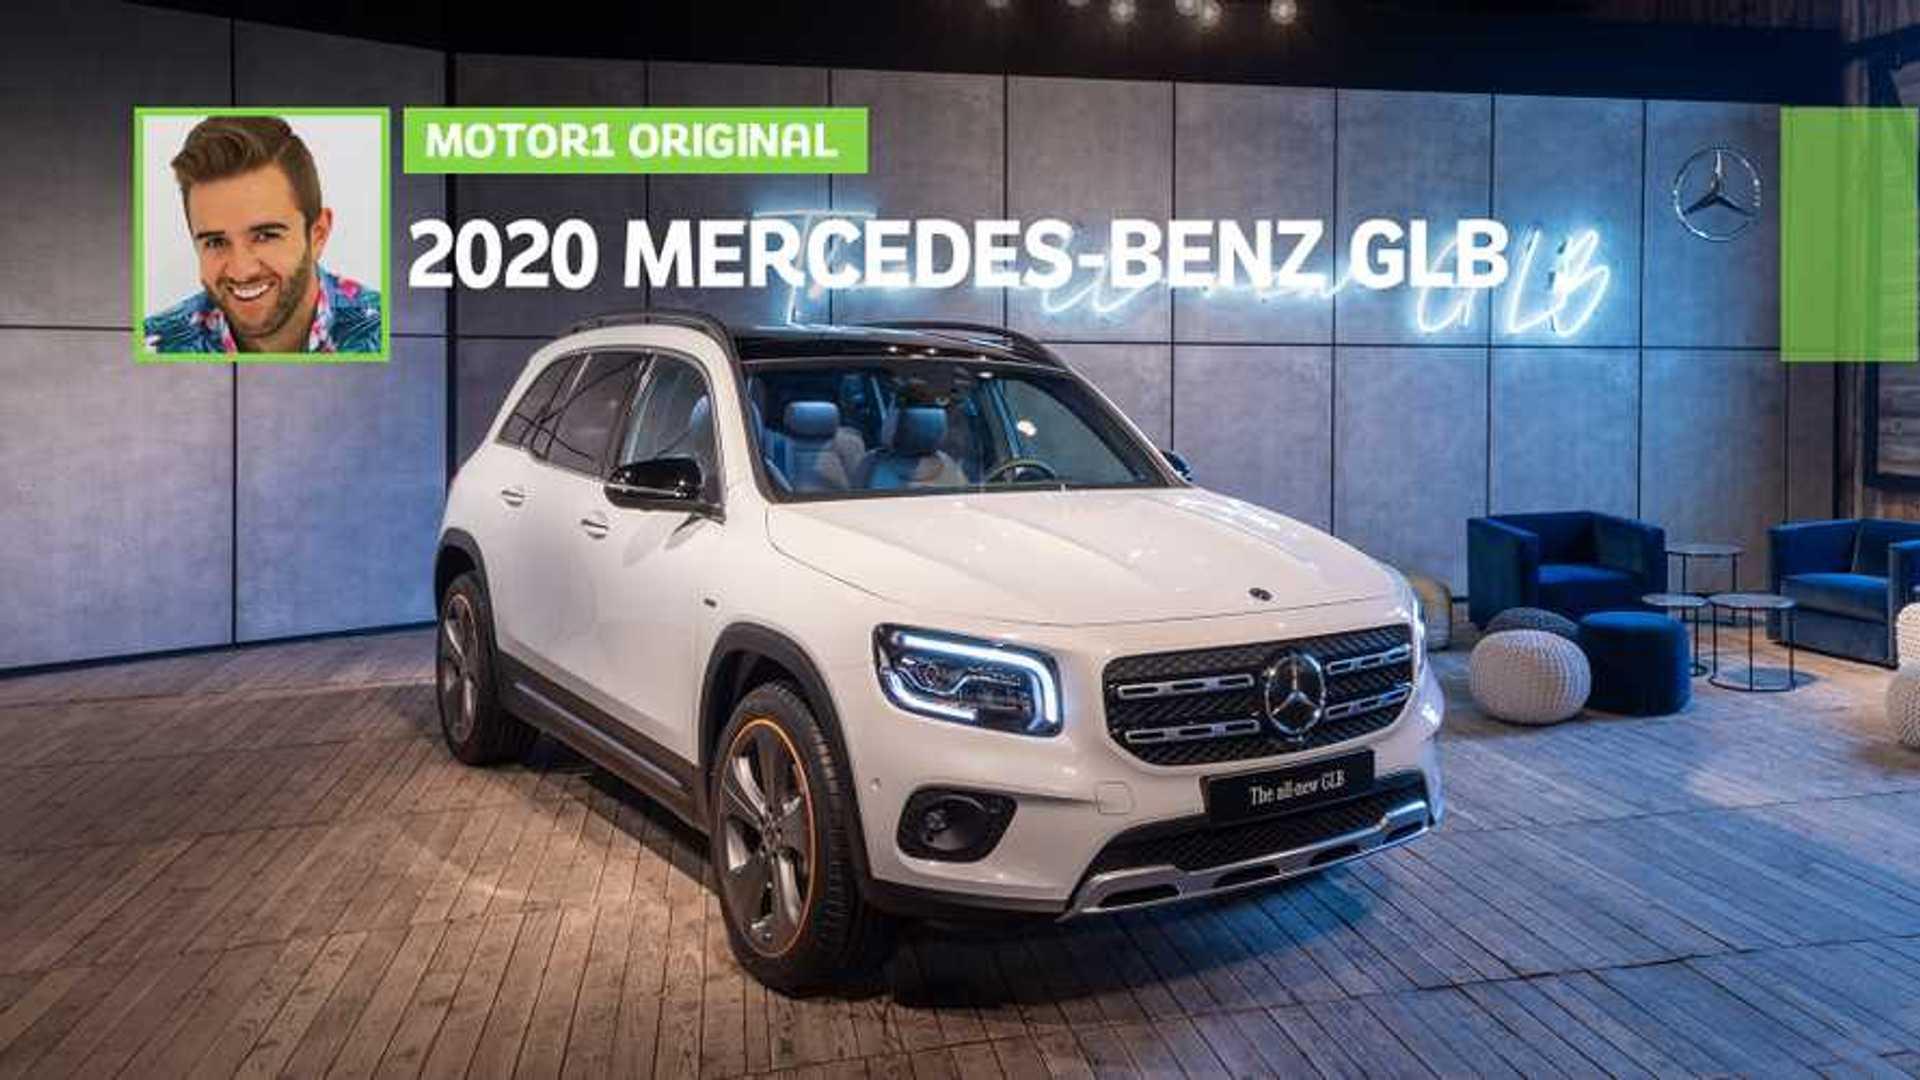 2020 Mercedes-Benz GLB: Specs, Design, Price >> 2020 Mercedes Benz Glb Class Debuts As Compact Seven Seat Suv